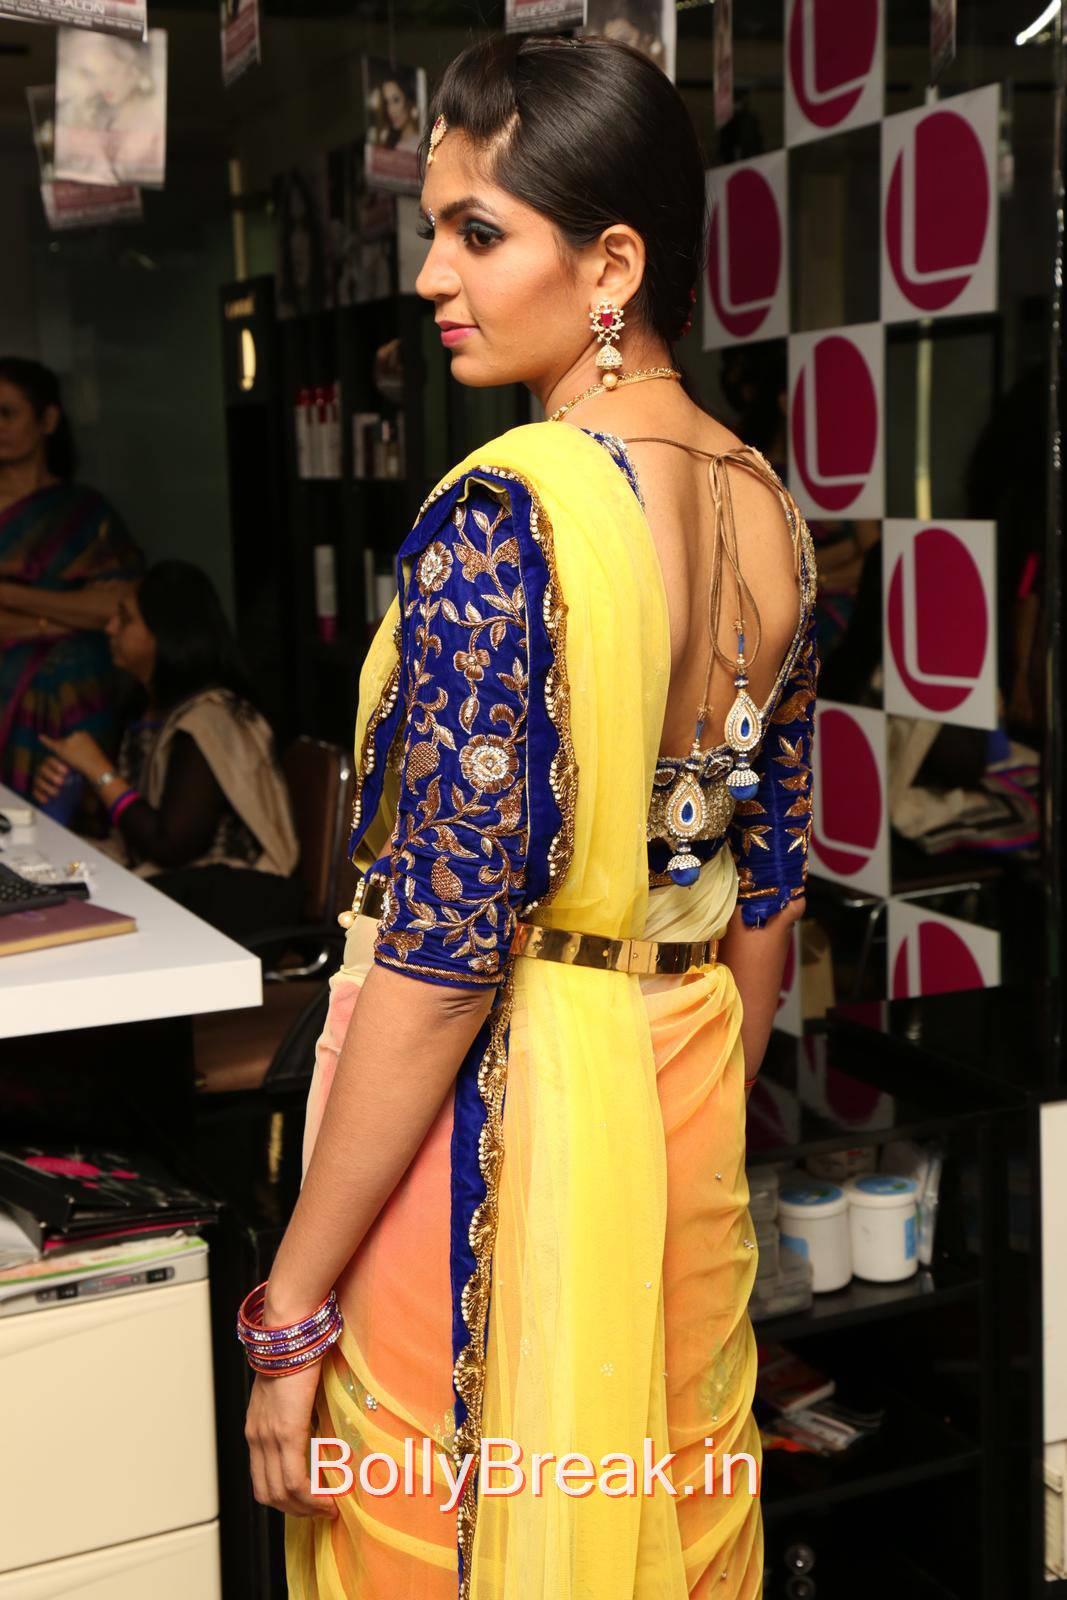 Anusha Photoshoot Stills, Anusha Hot Pics from Bridal Dream Make up At Lakme Salon